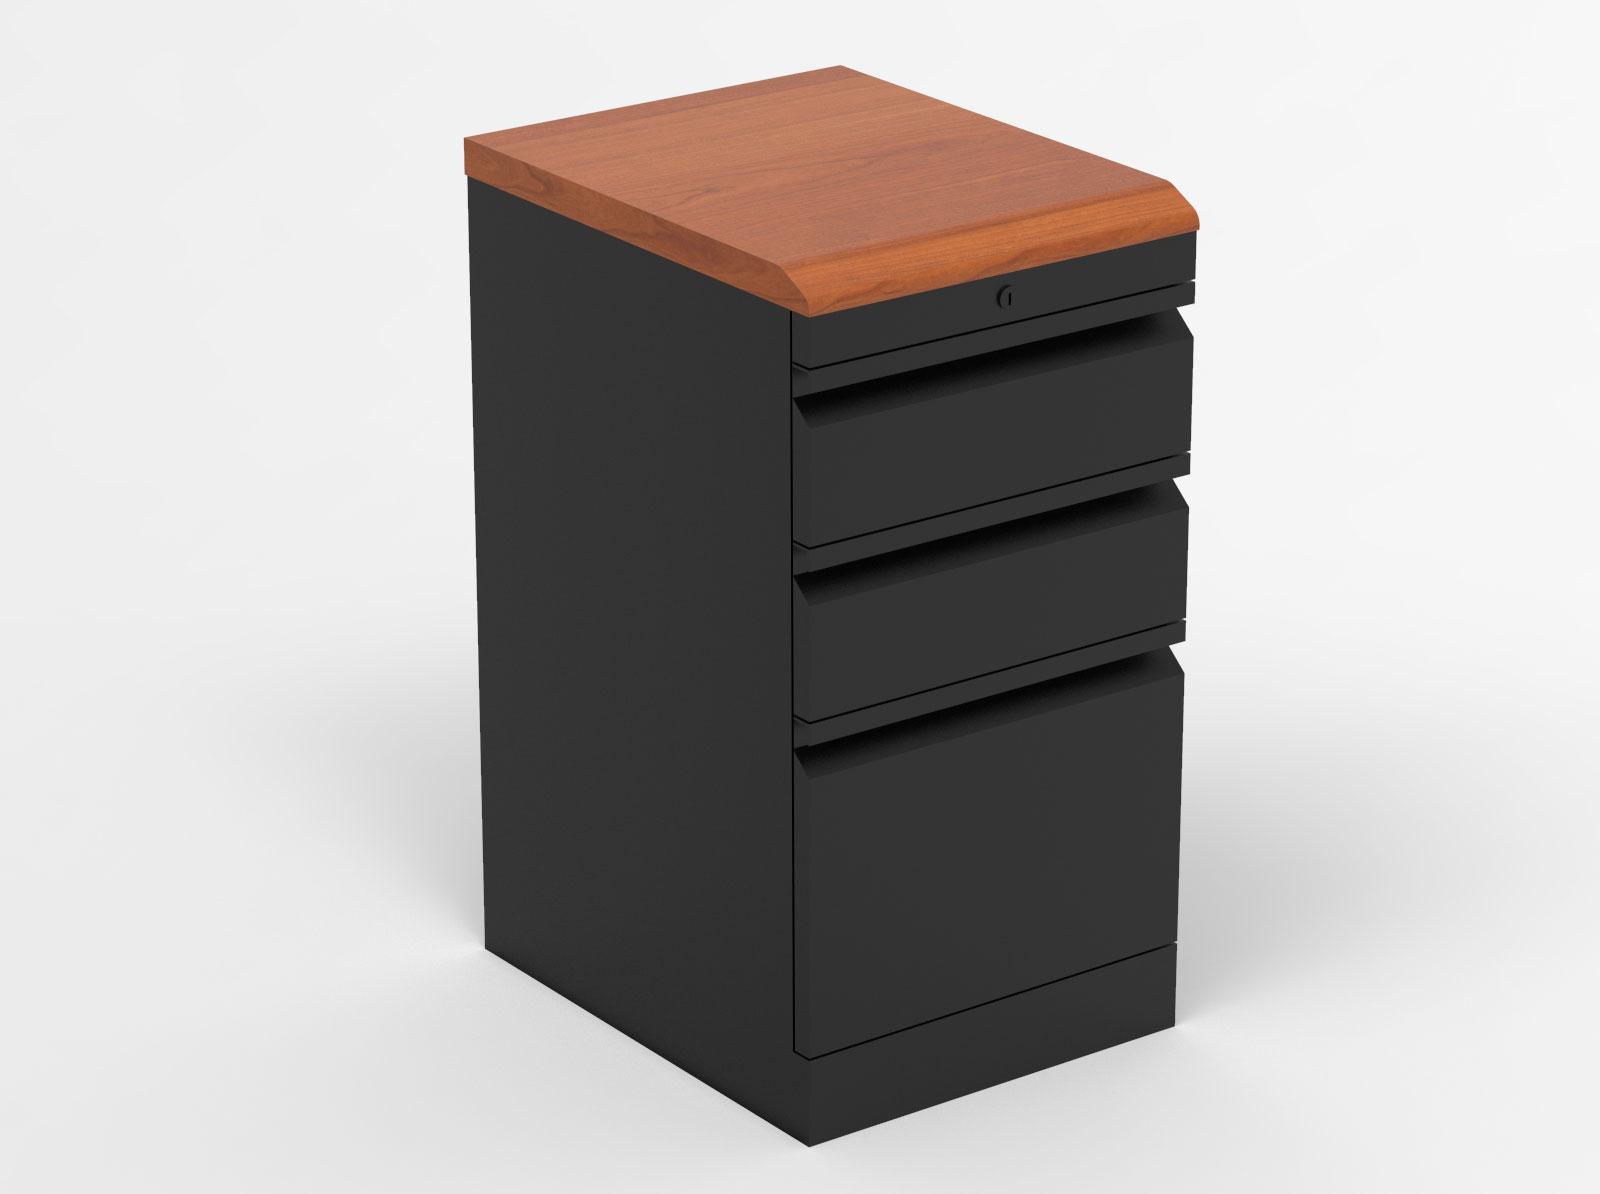 Box Box File With Premium Wood Top Caretta Workspace